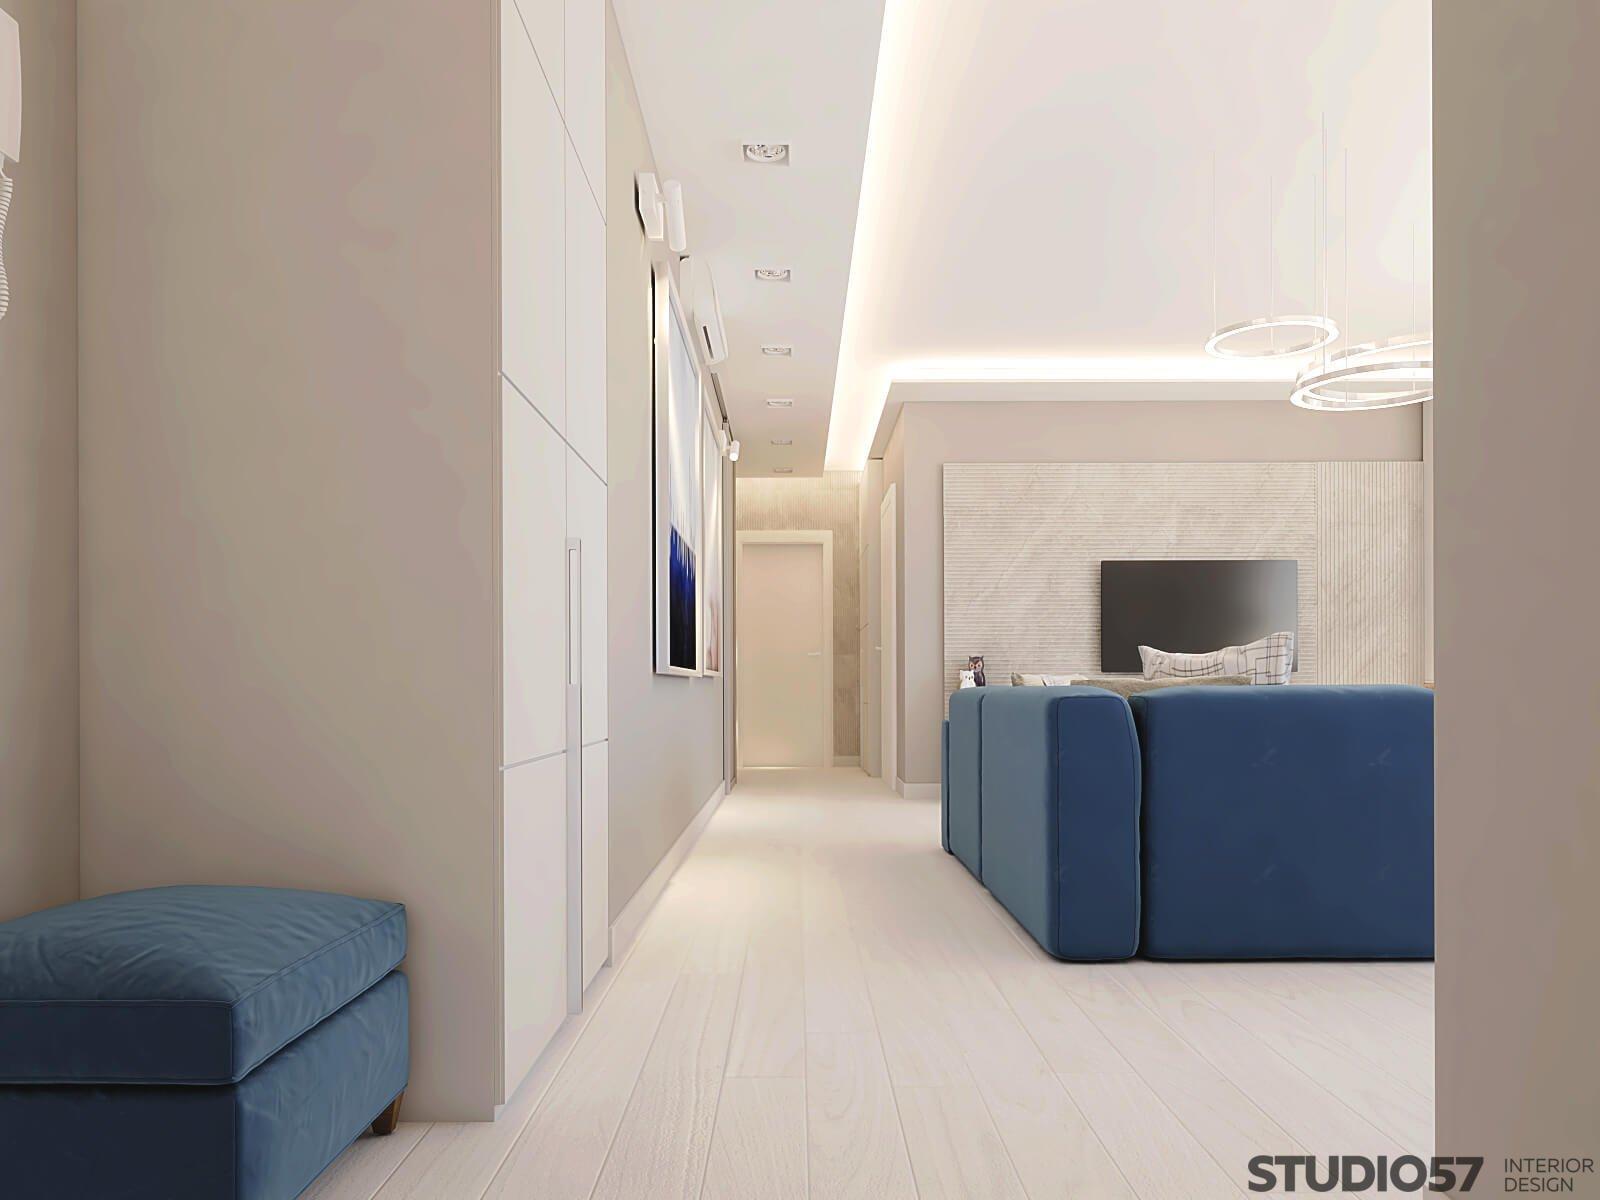 Картинка коридора с видом на гостиную